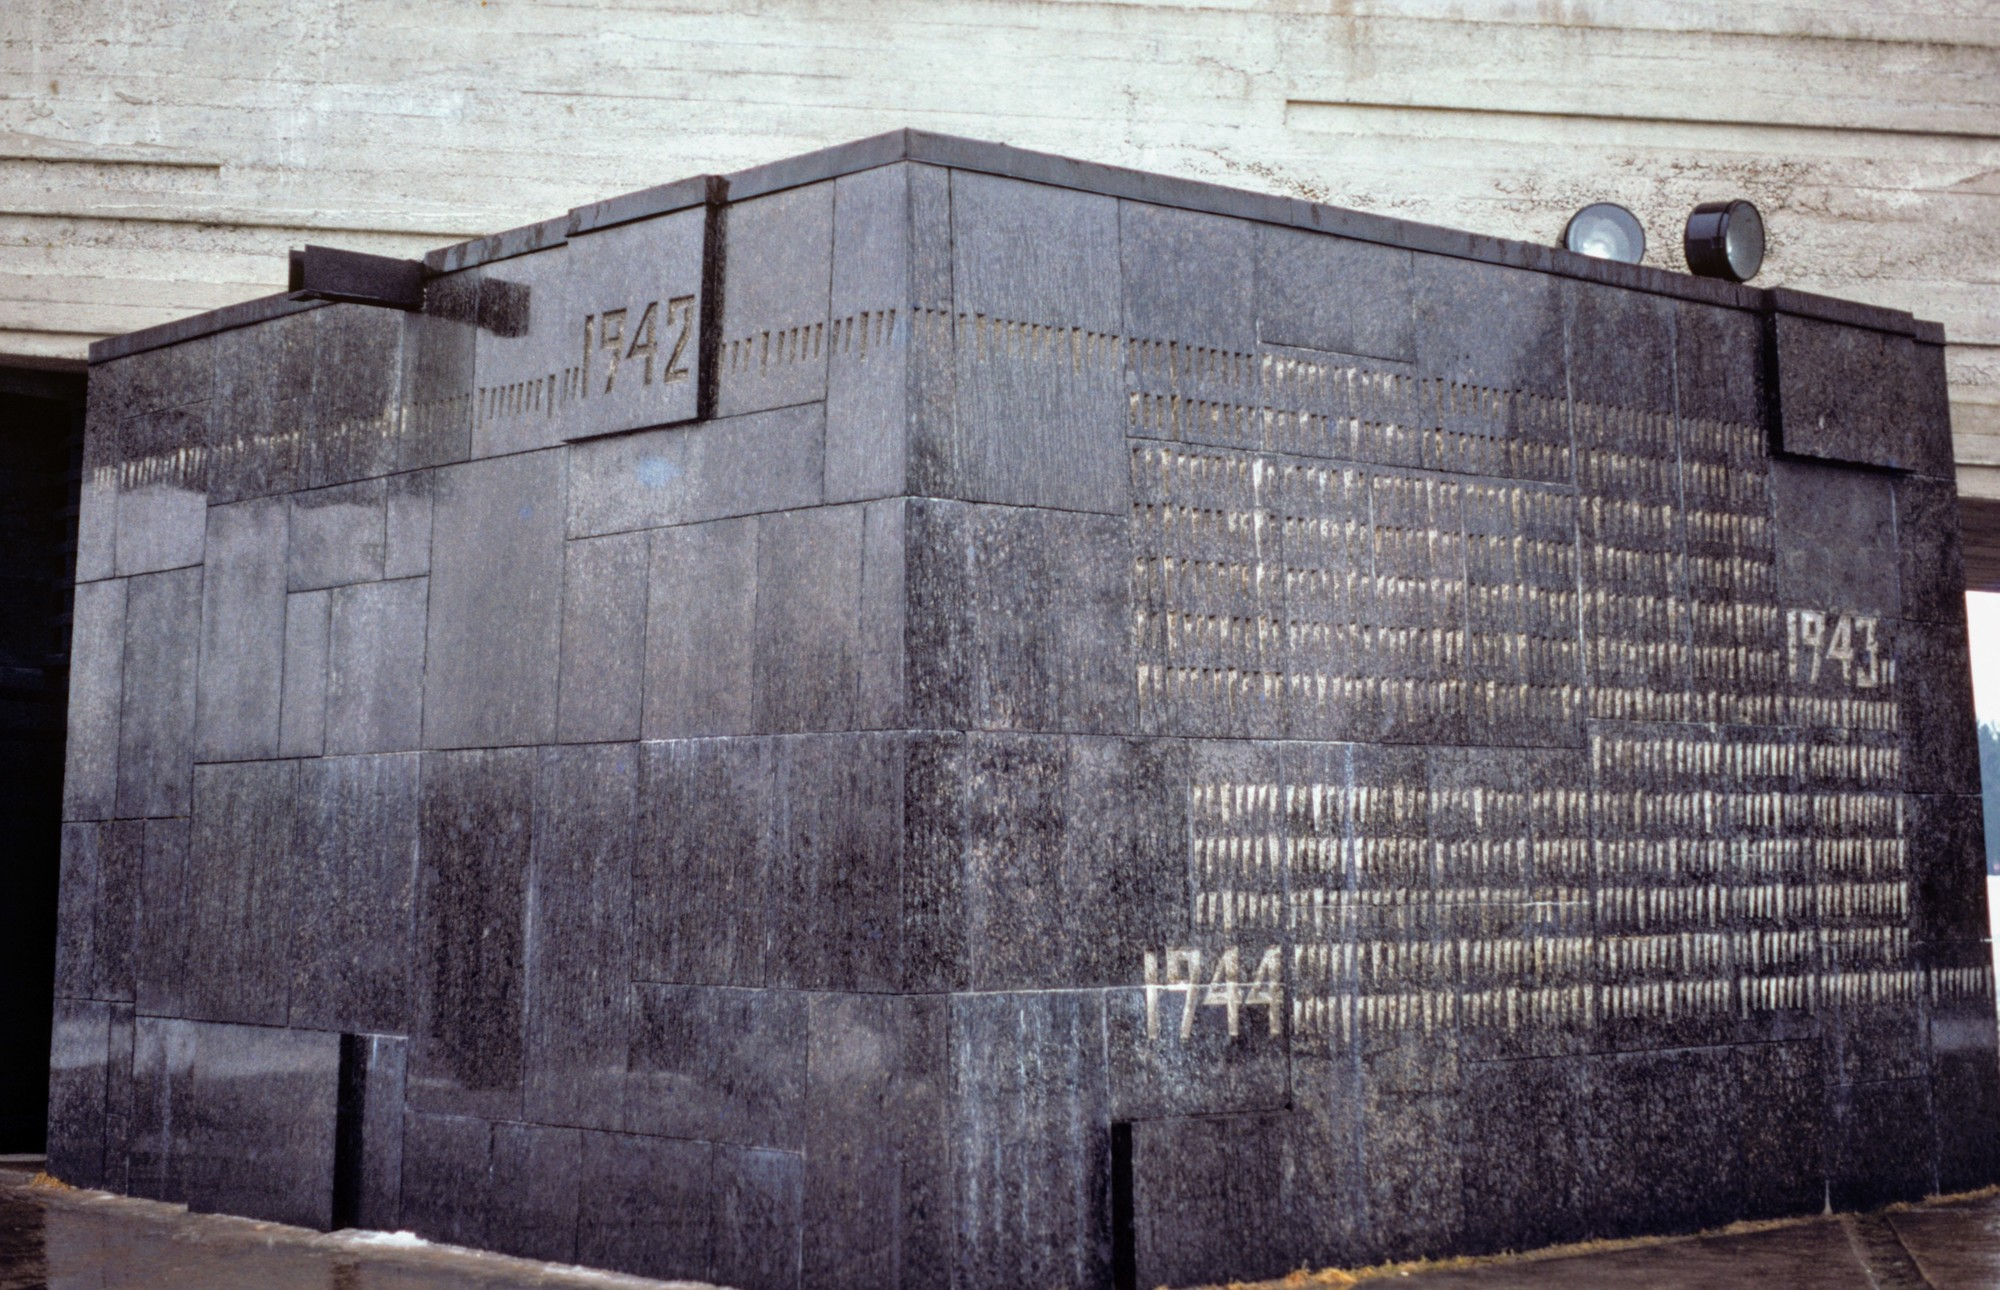 Ms2020_001_BurtonDoug_B1_F8_7_1979_Soviet_Union_003.jpg